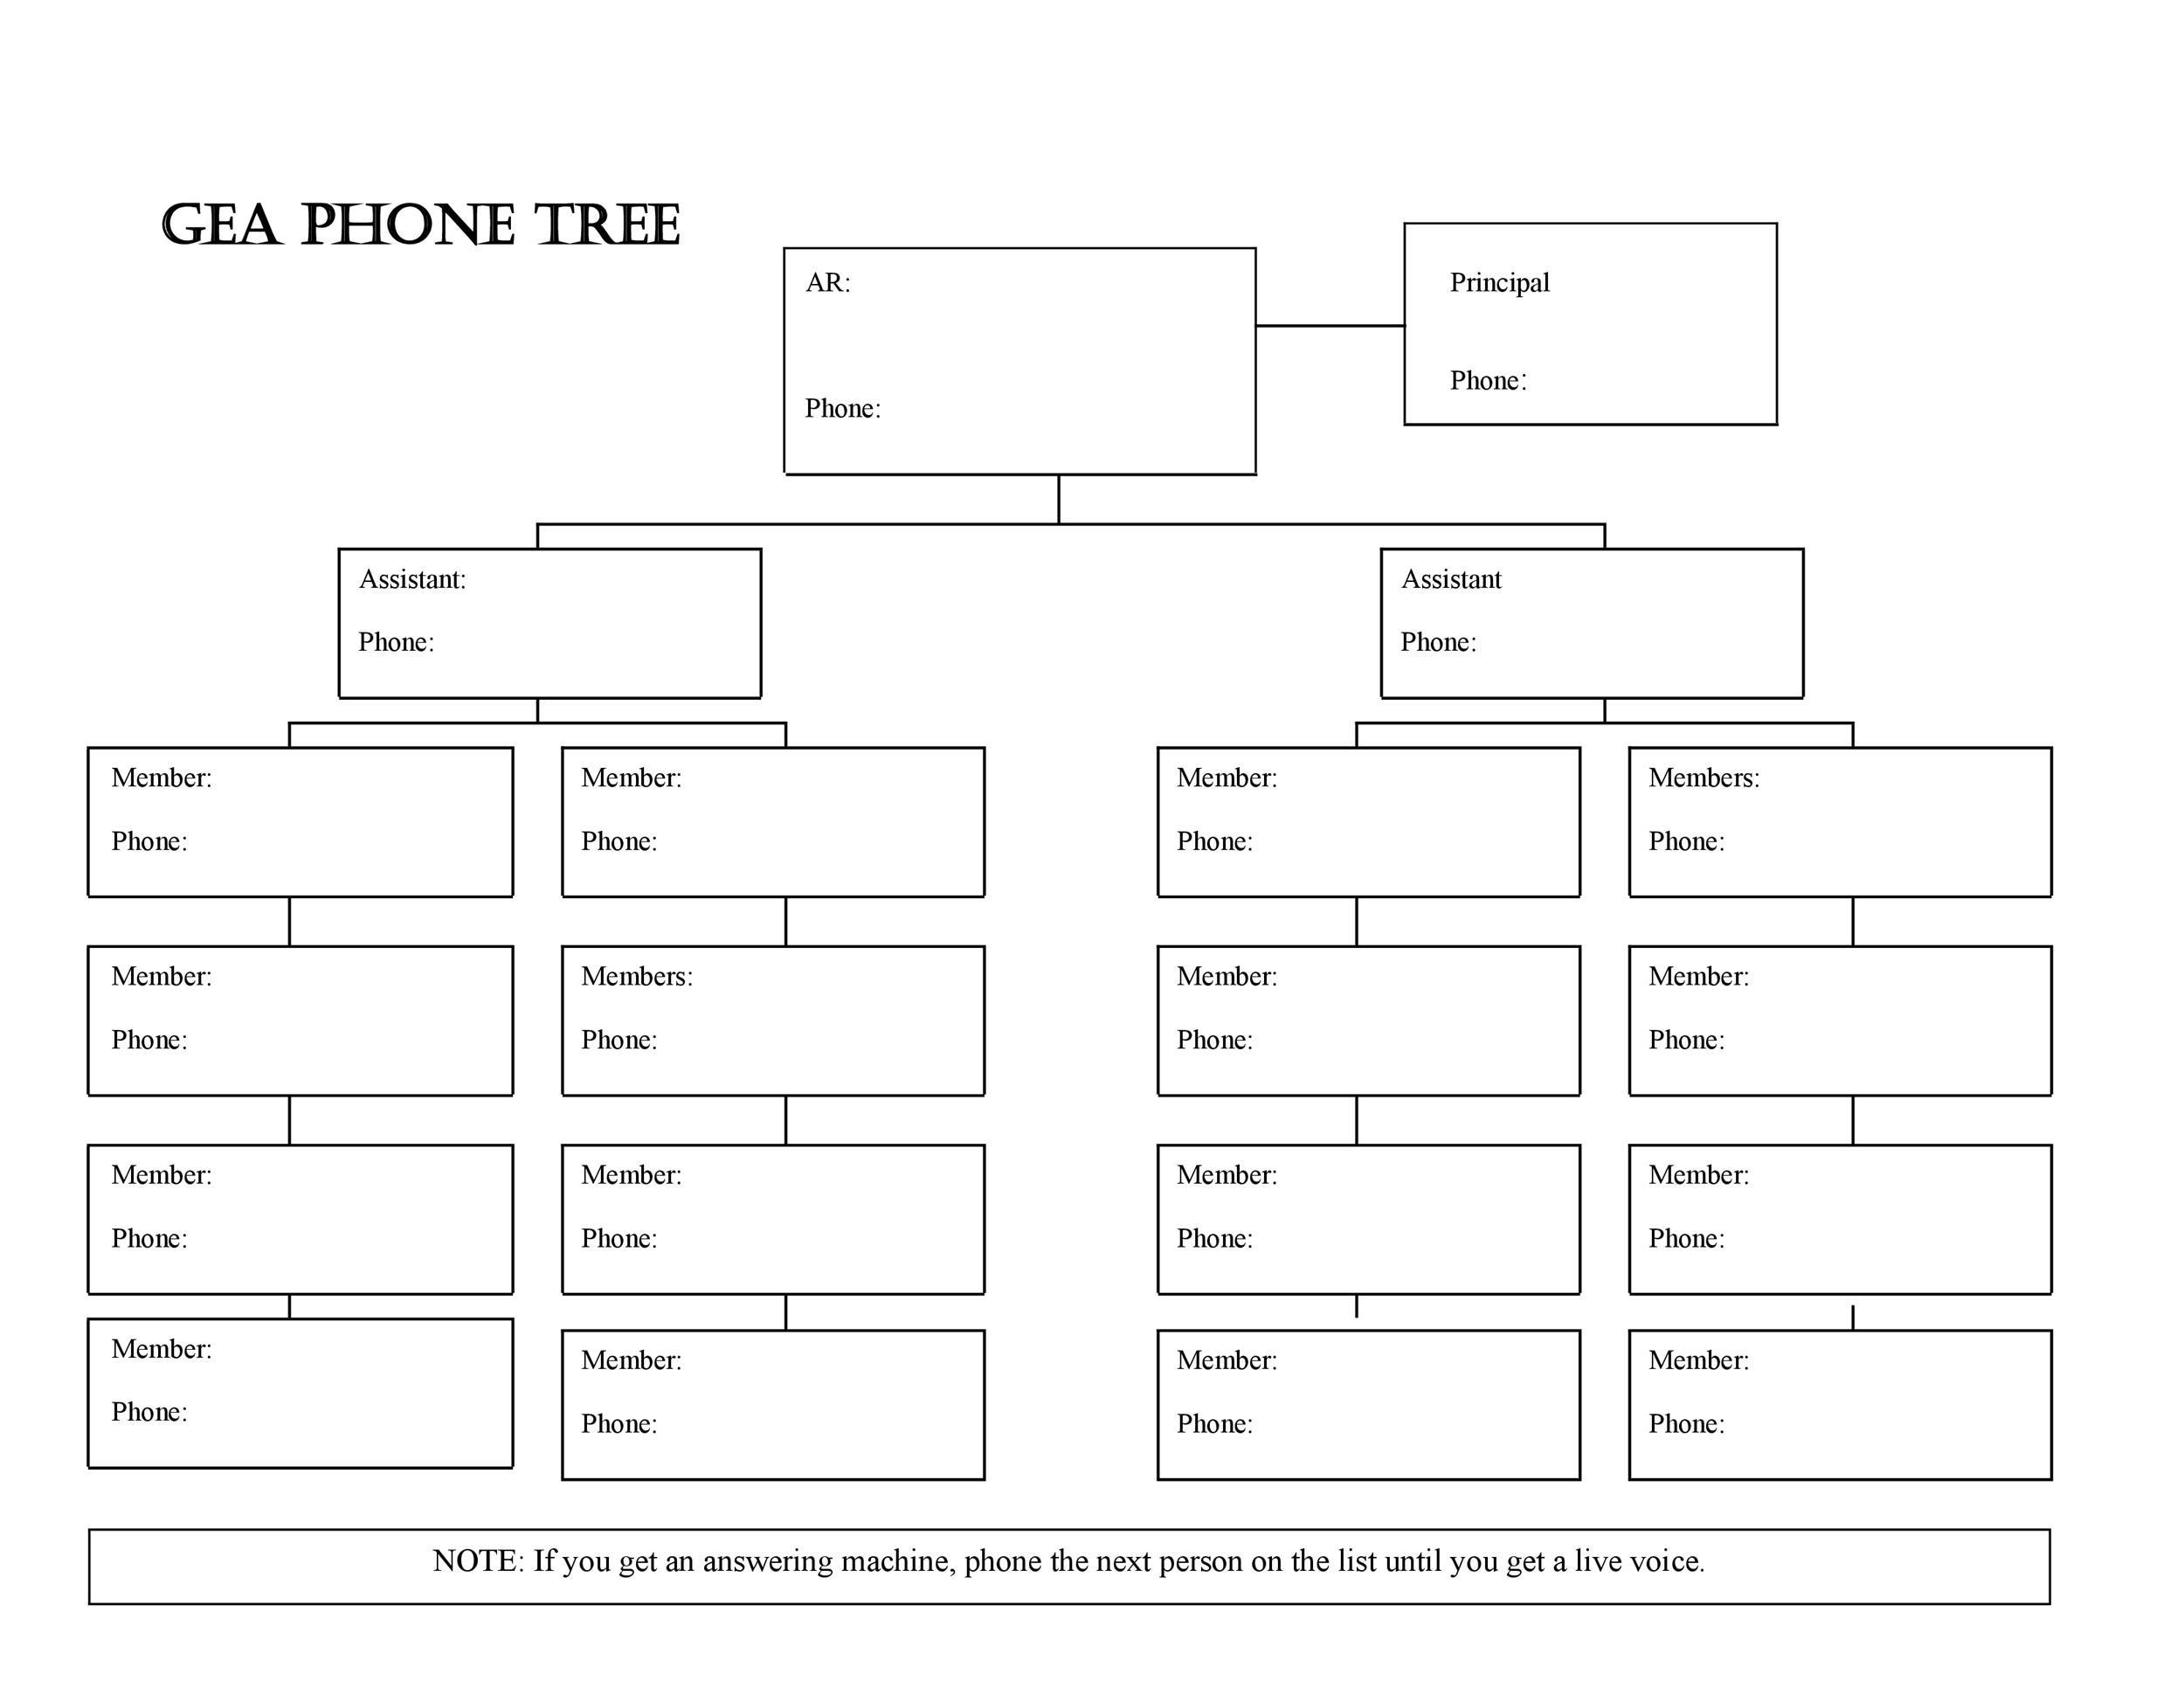 Free phone tree template 35